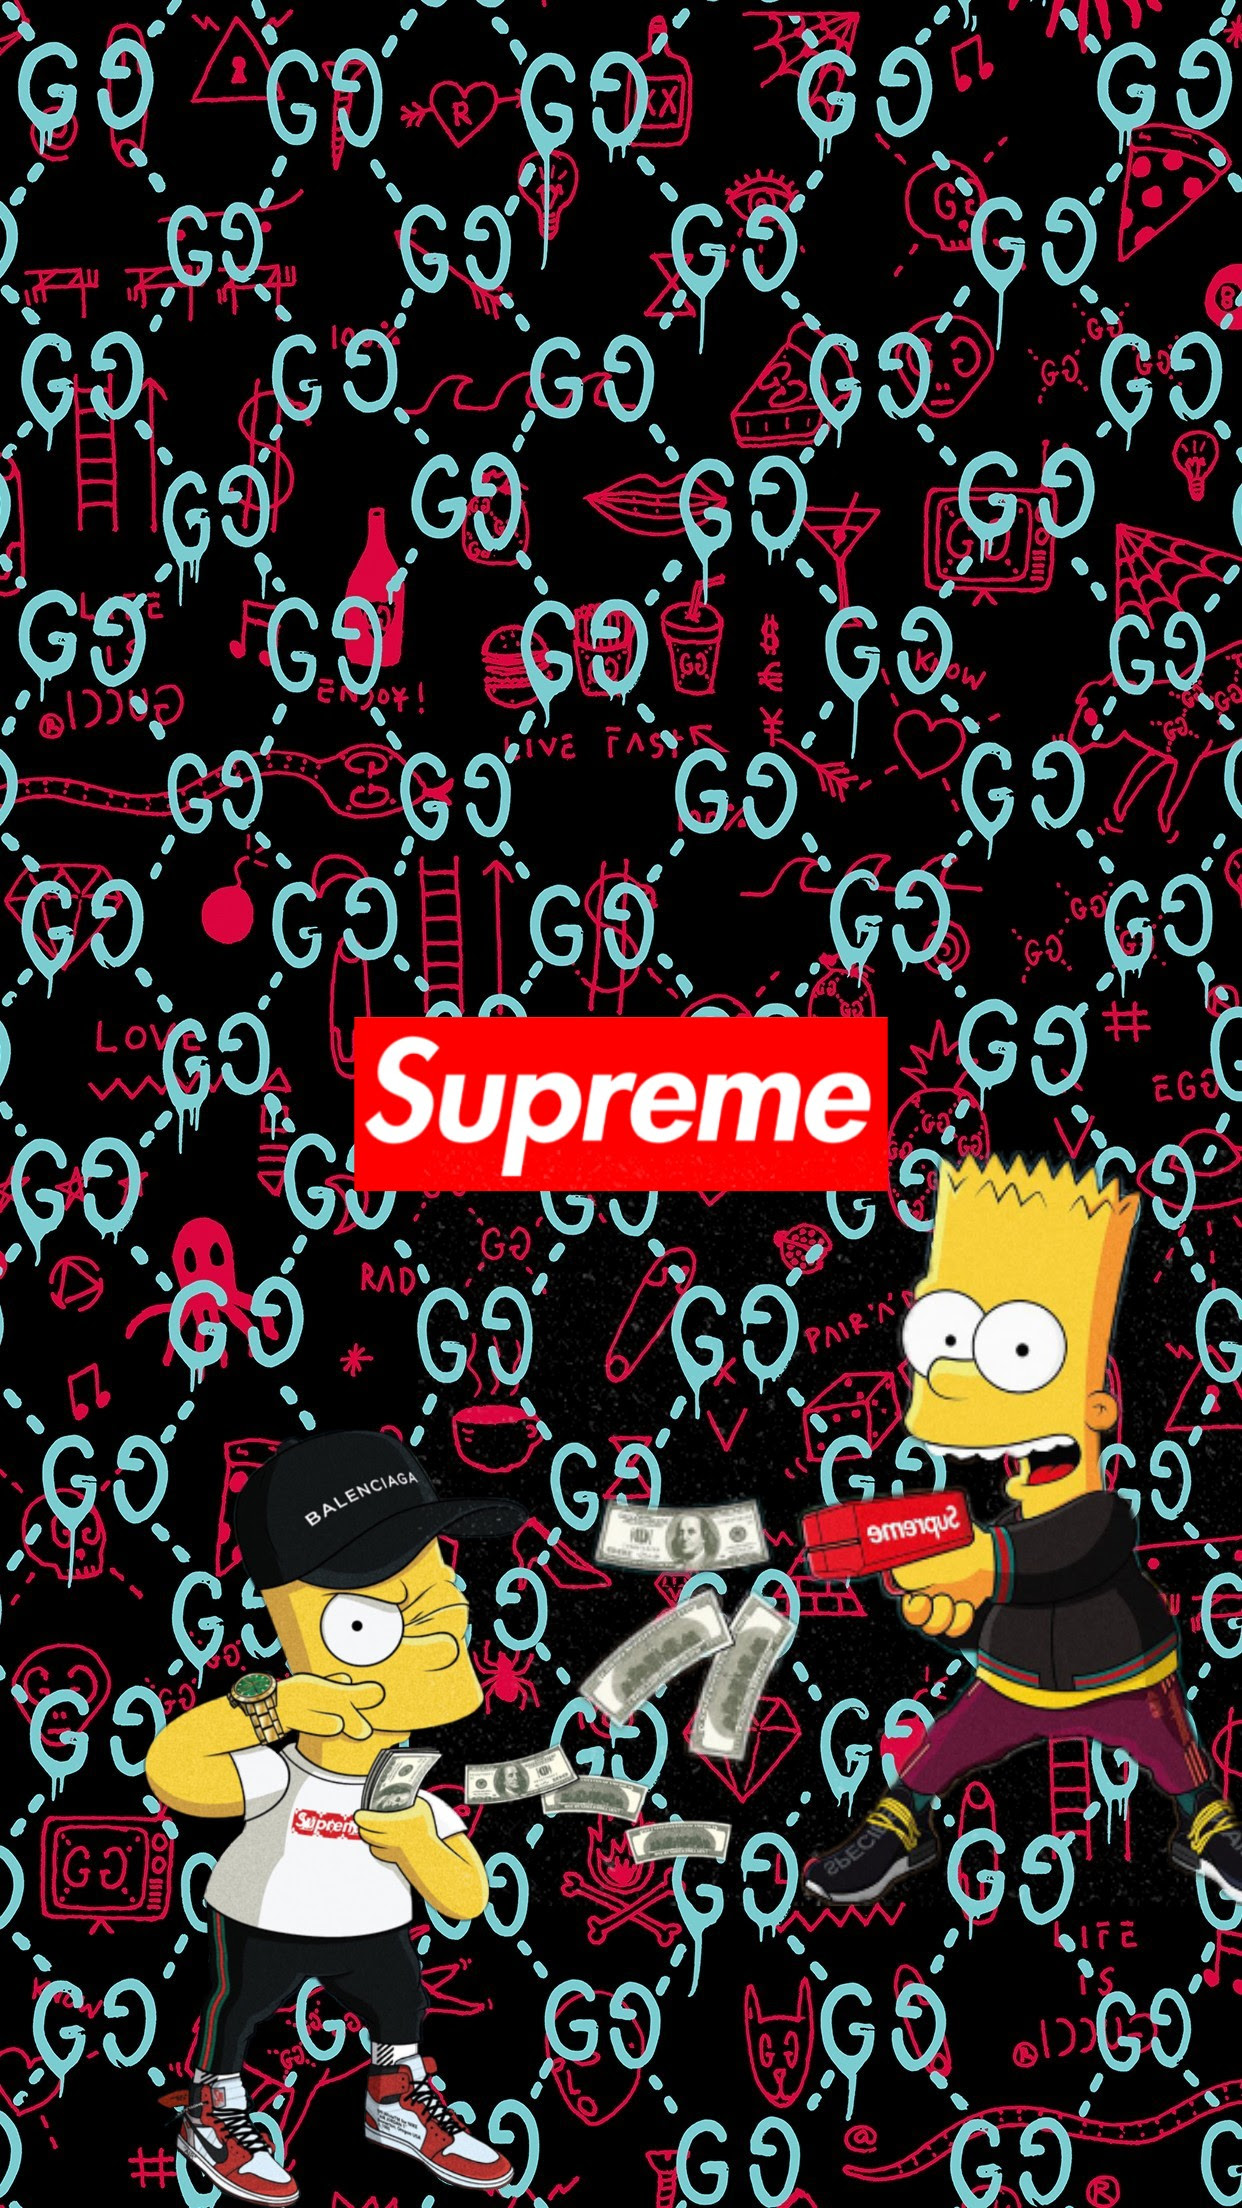 supreme bape simpsons - Image by adellah048